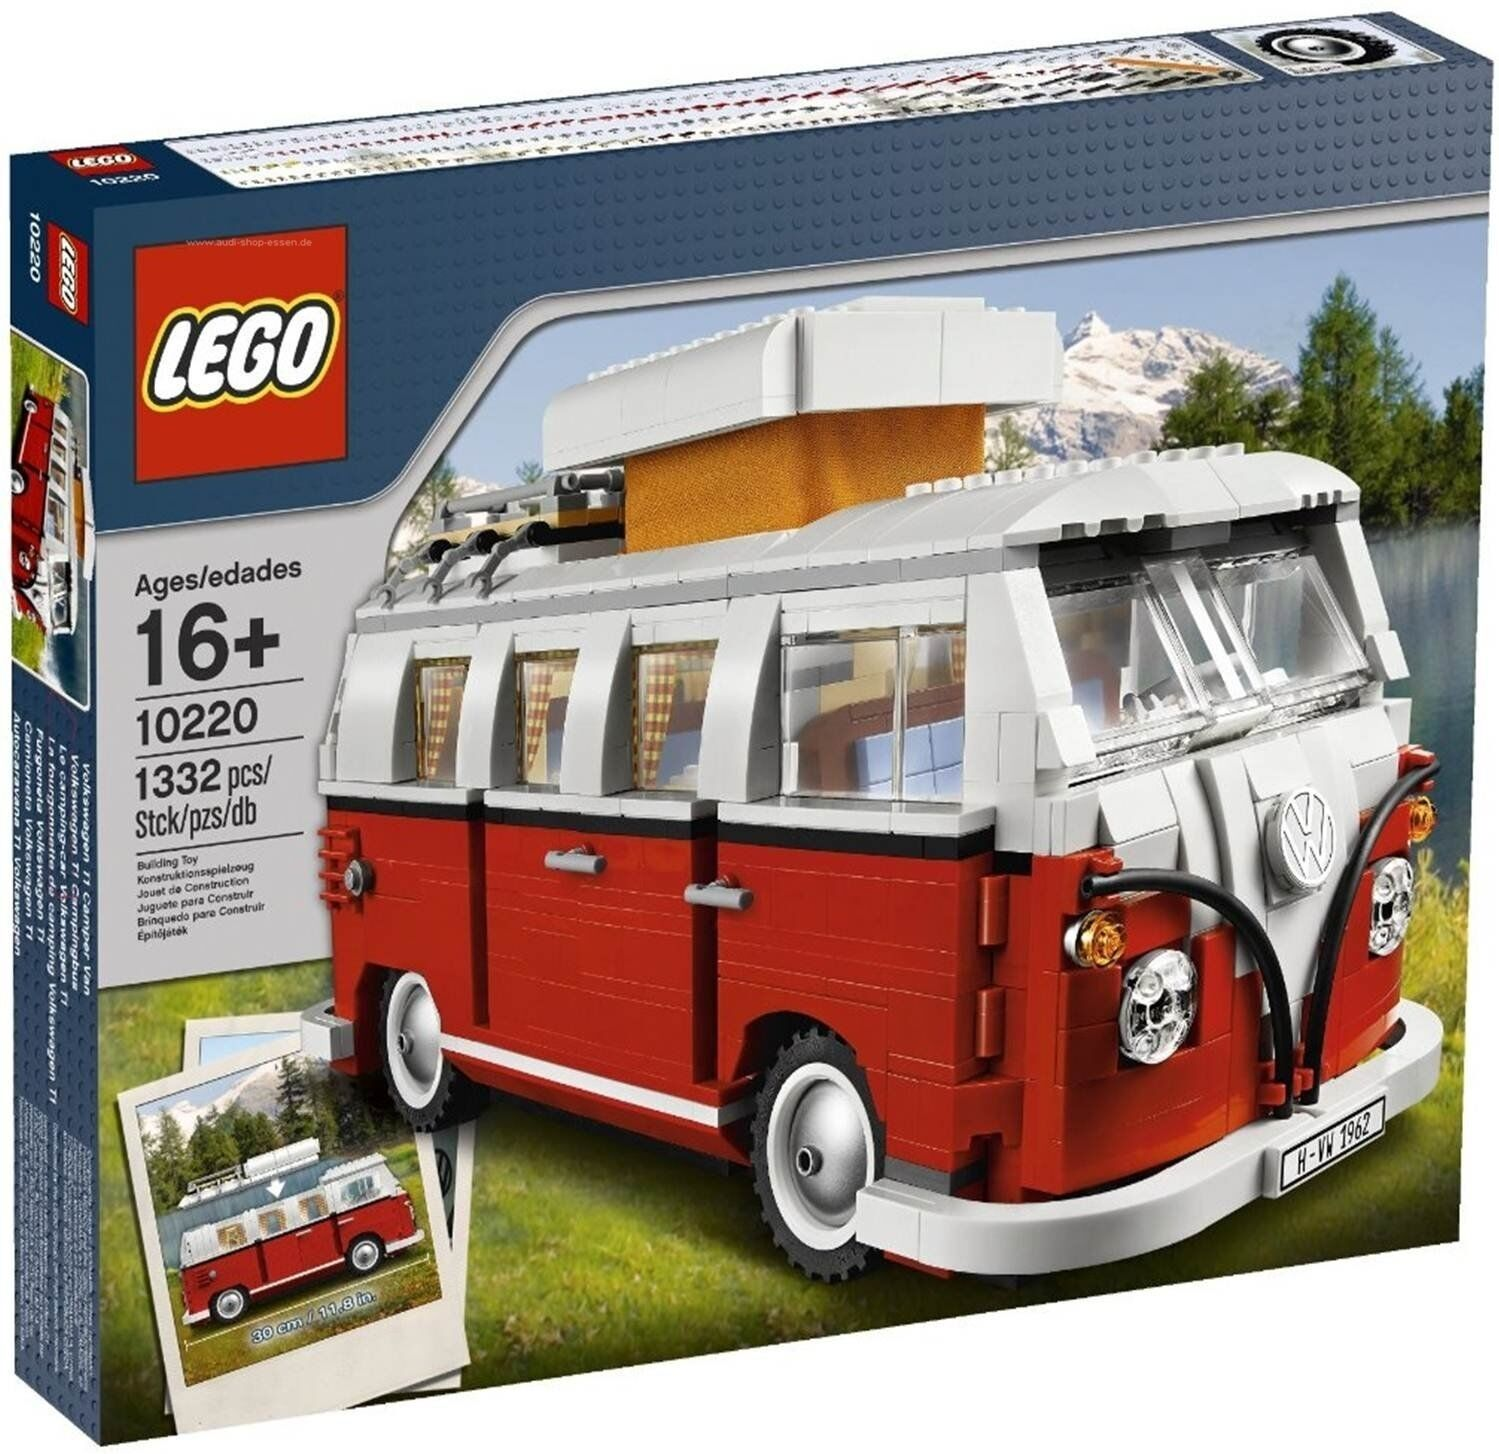 Orginal VW Lego Bulli T1 red white Campingbus Lego Creator T1 Buli Campingbus